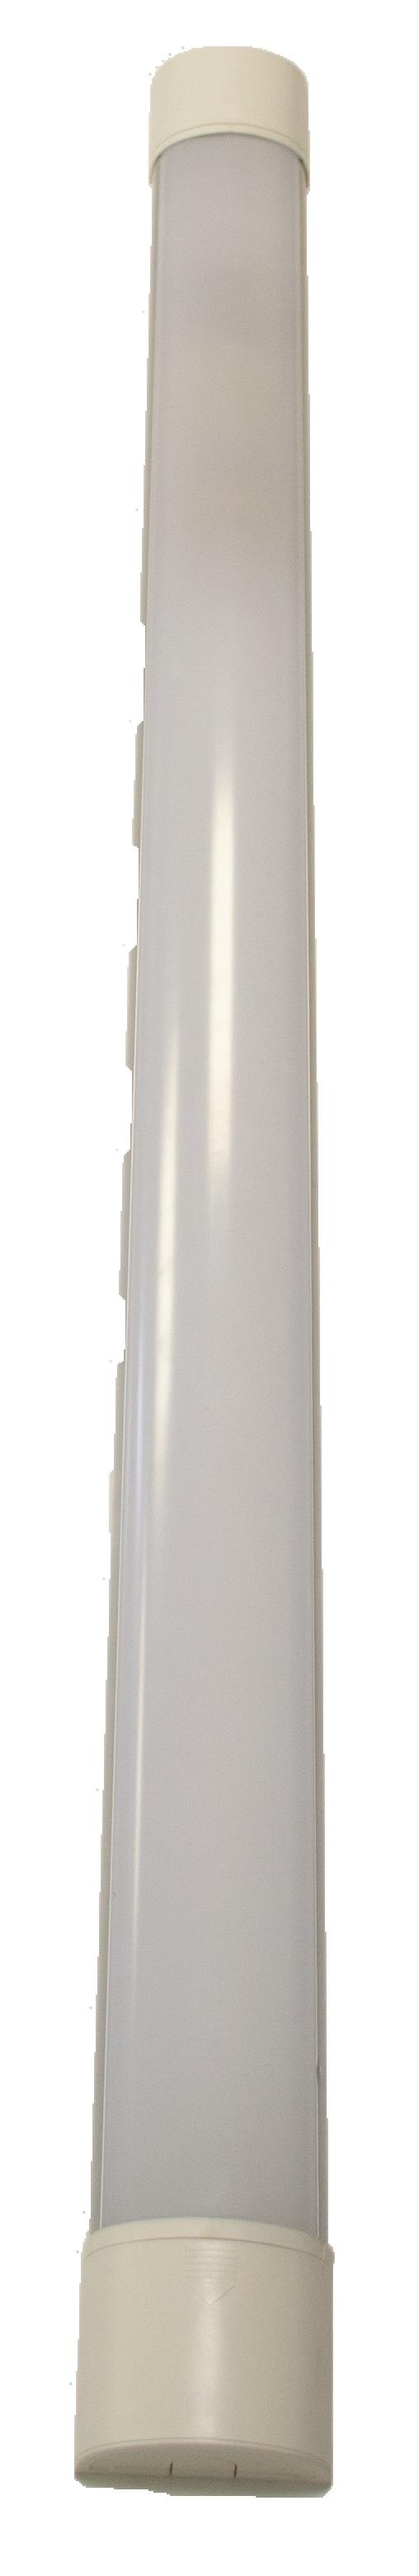 60W 1500mm LED Batten Fitting - CCT